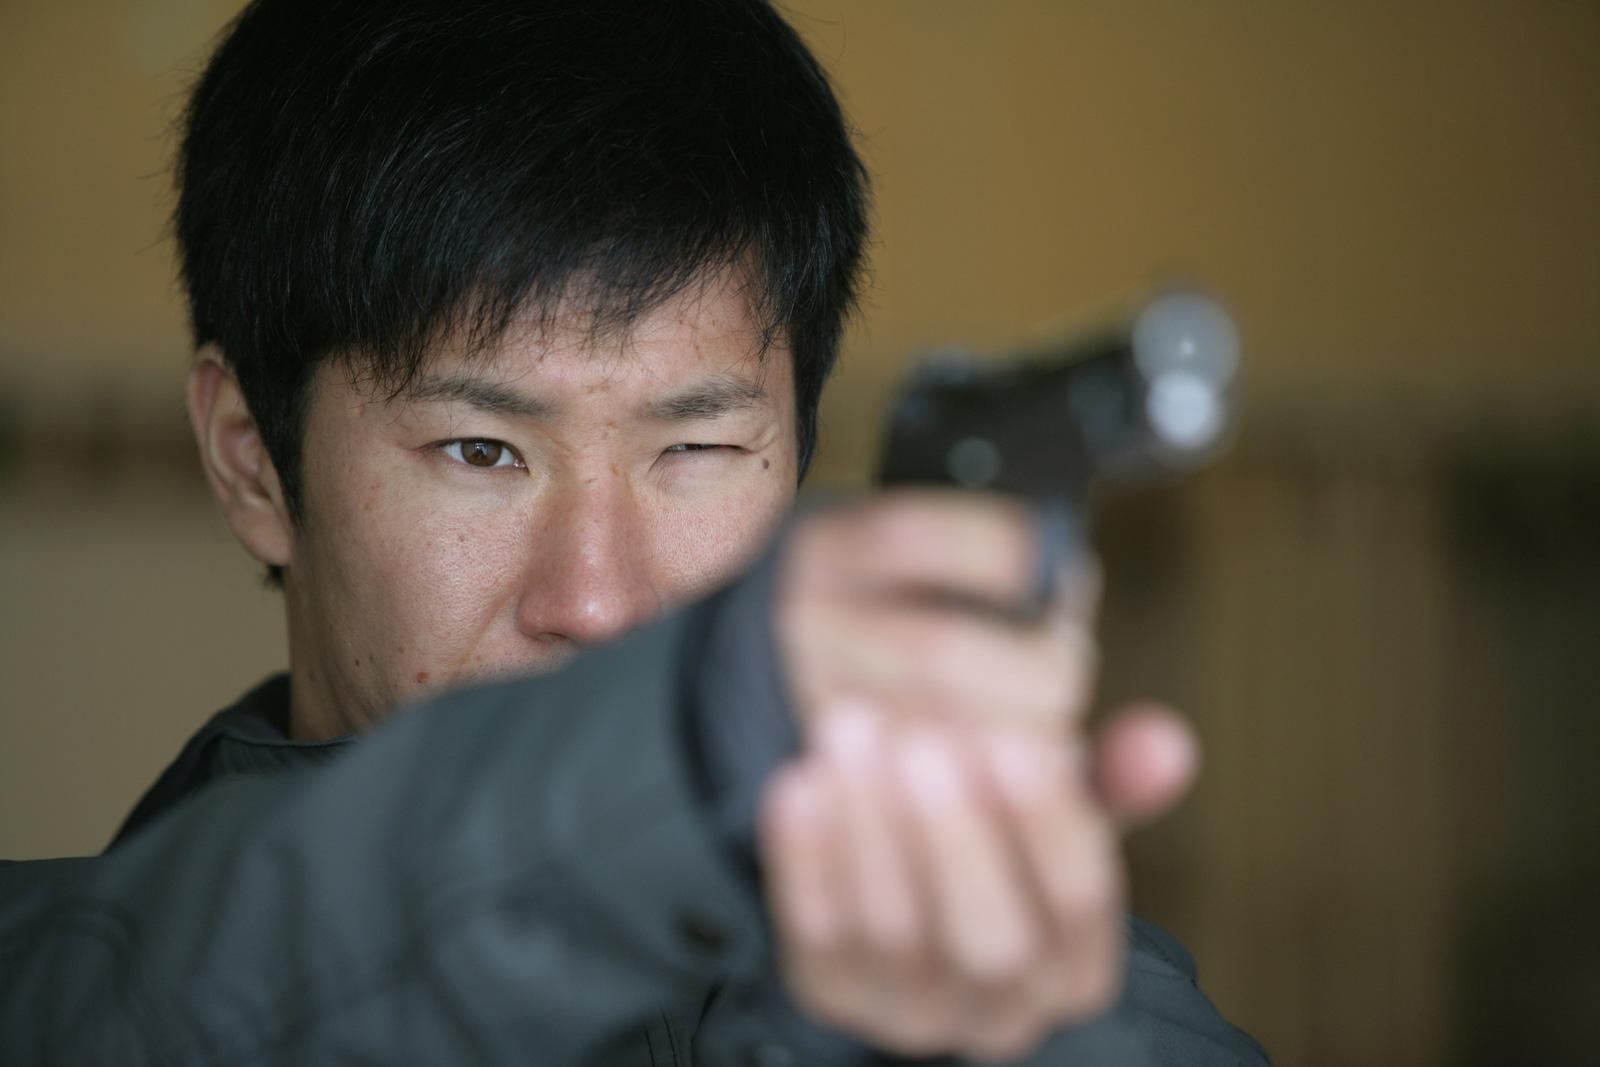 sauber-shooting-kobayashi-jan2011.jpg (267.61 Kb)